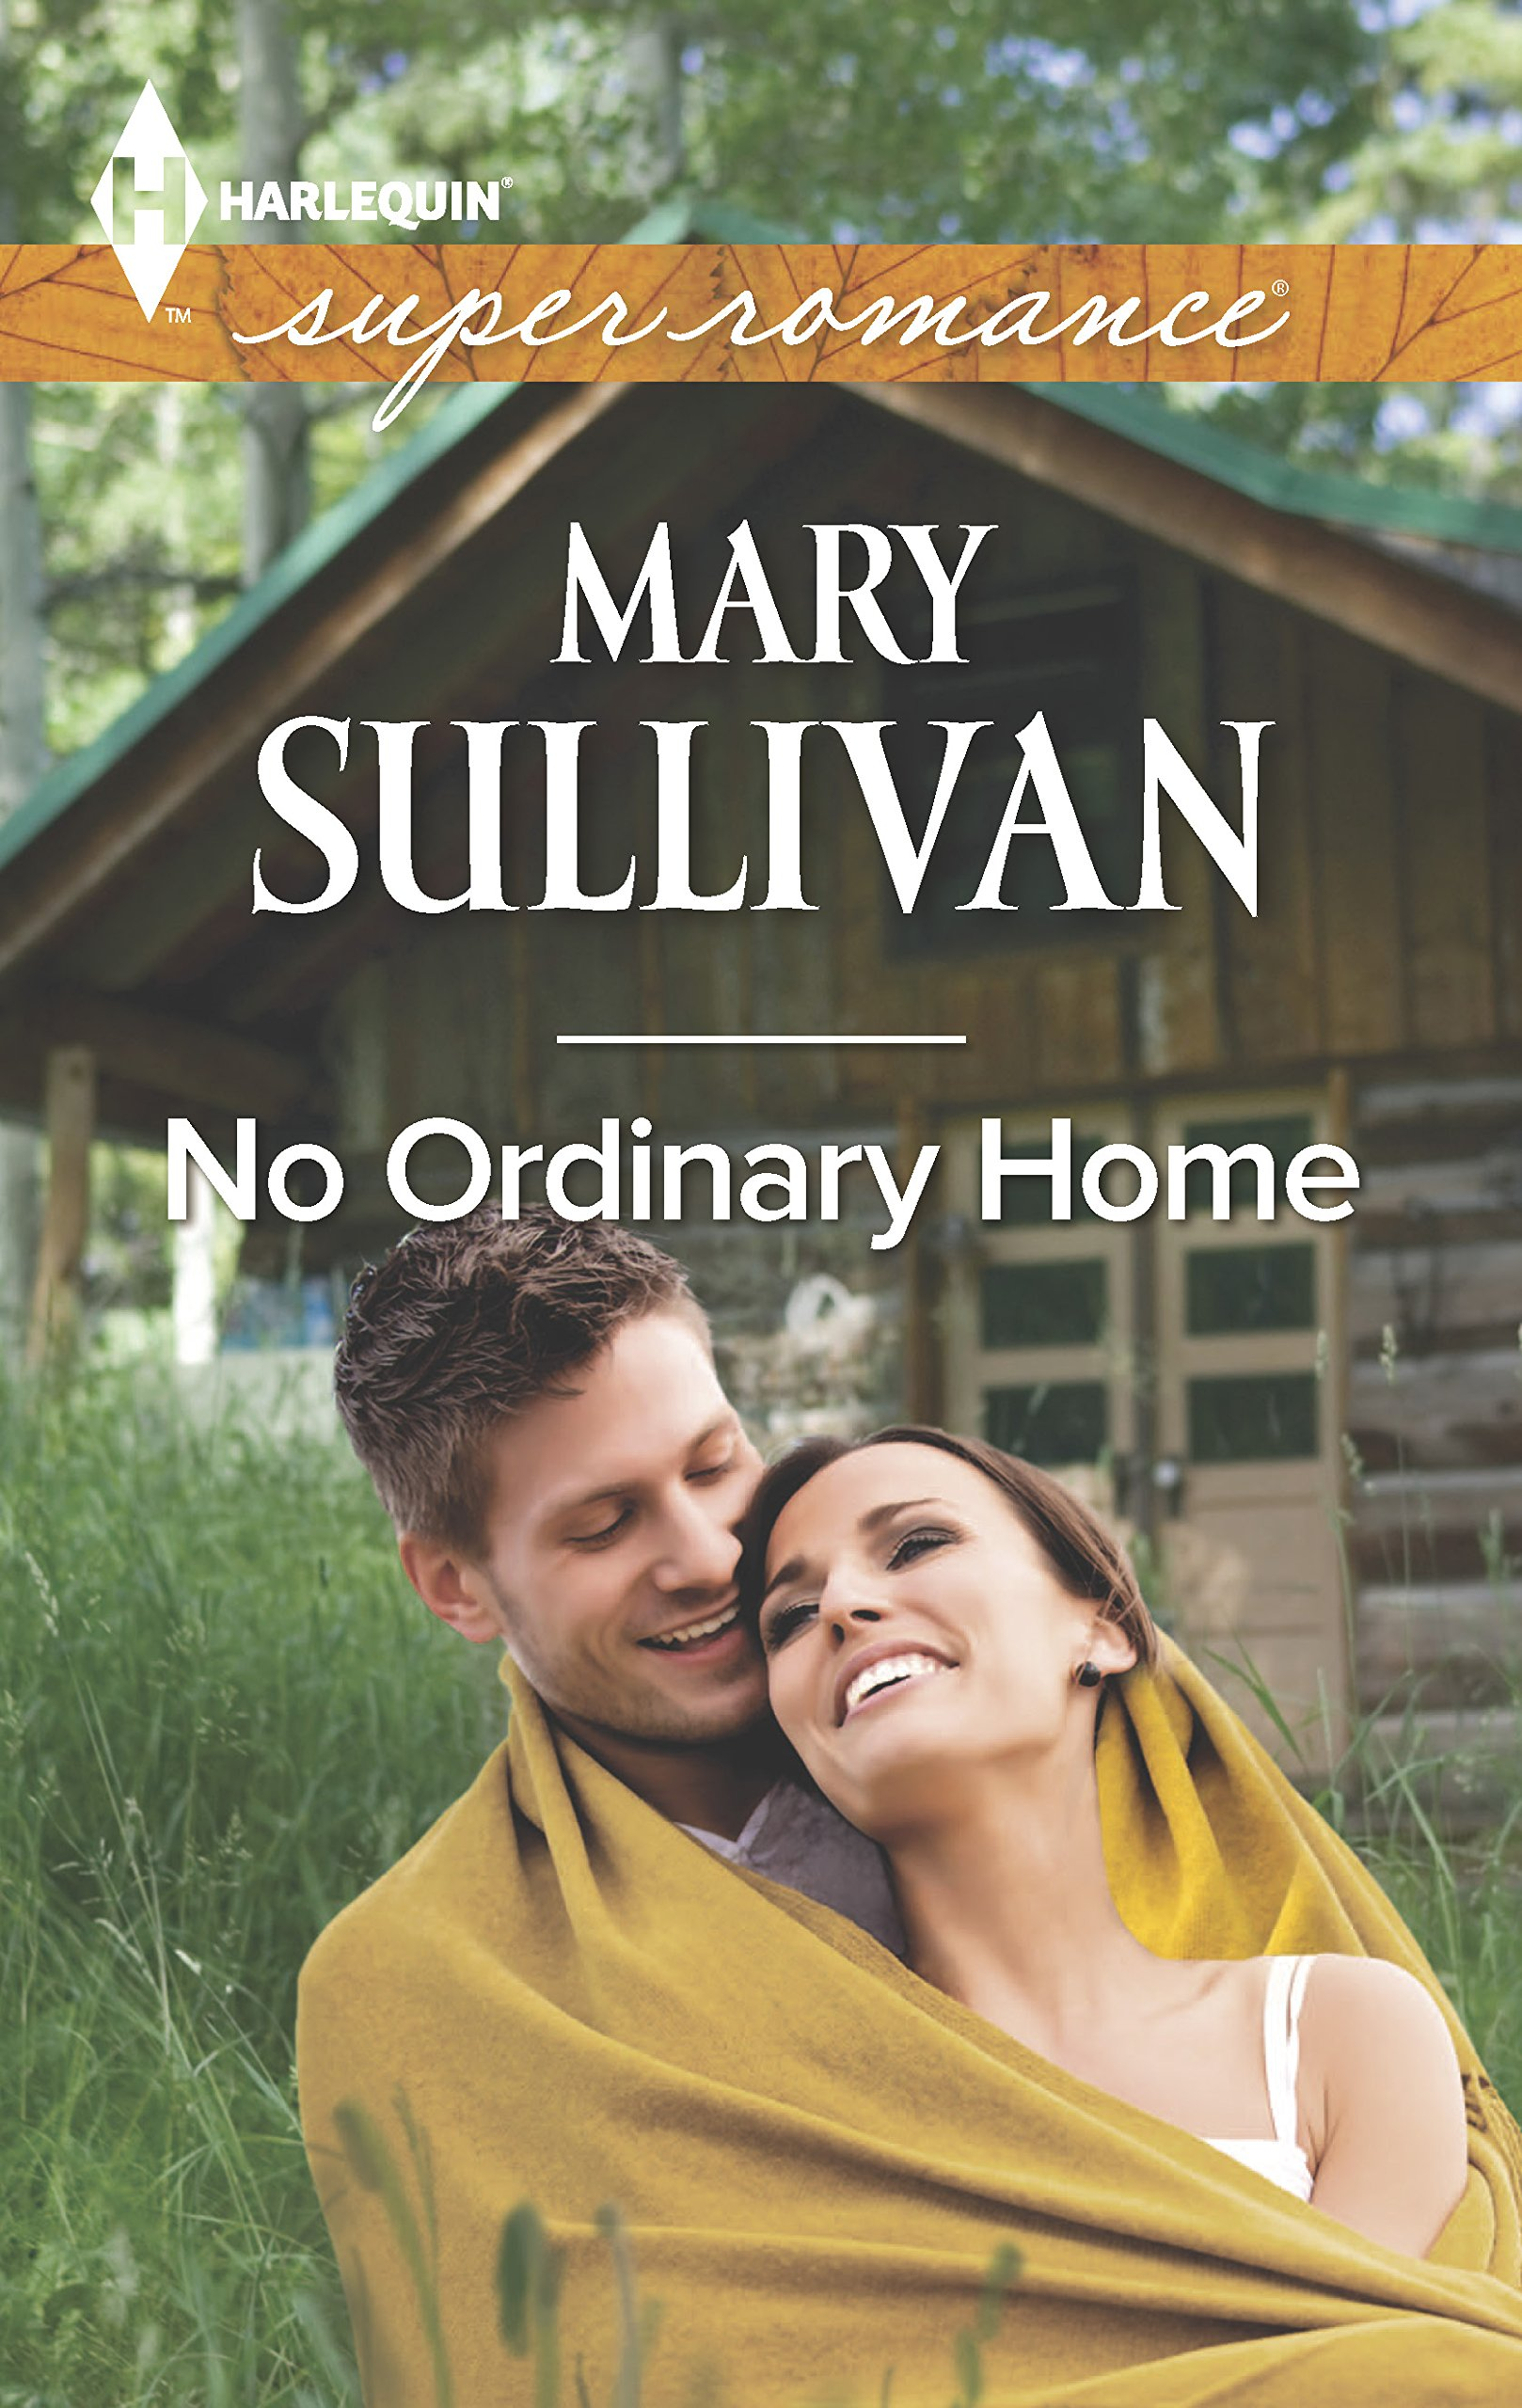 No Ordinary Home (Harlequin Super Romance) pdf